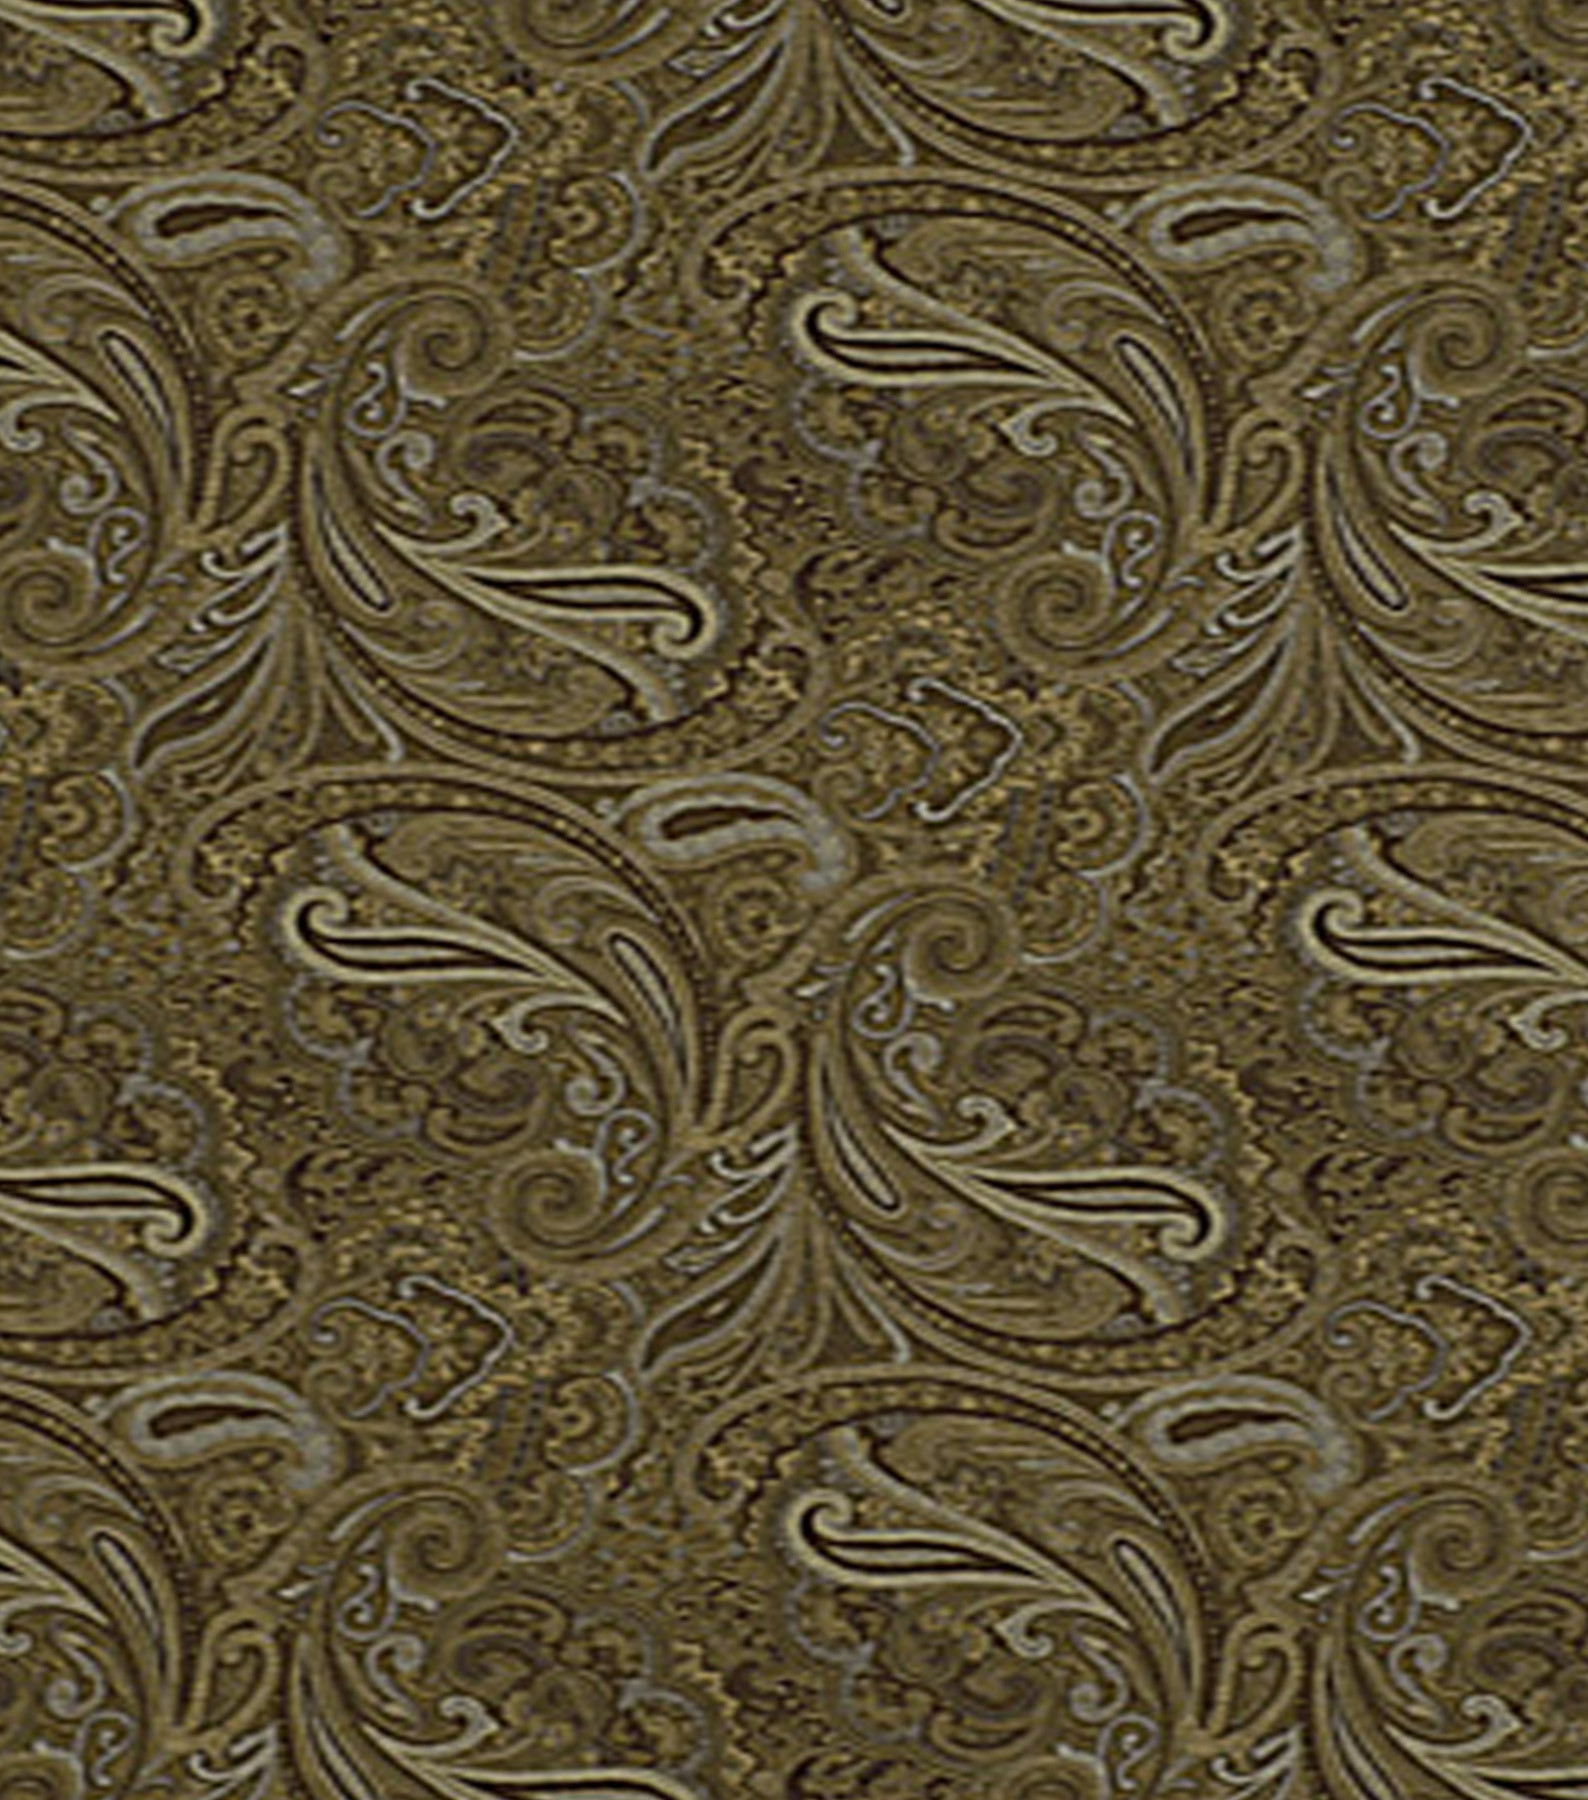 Robert Allen Home Multi Purpose Decor Fabric 54 U0022 Patna Paisley Fawn